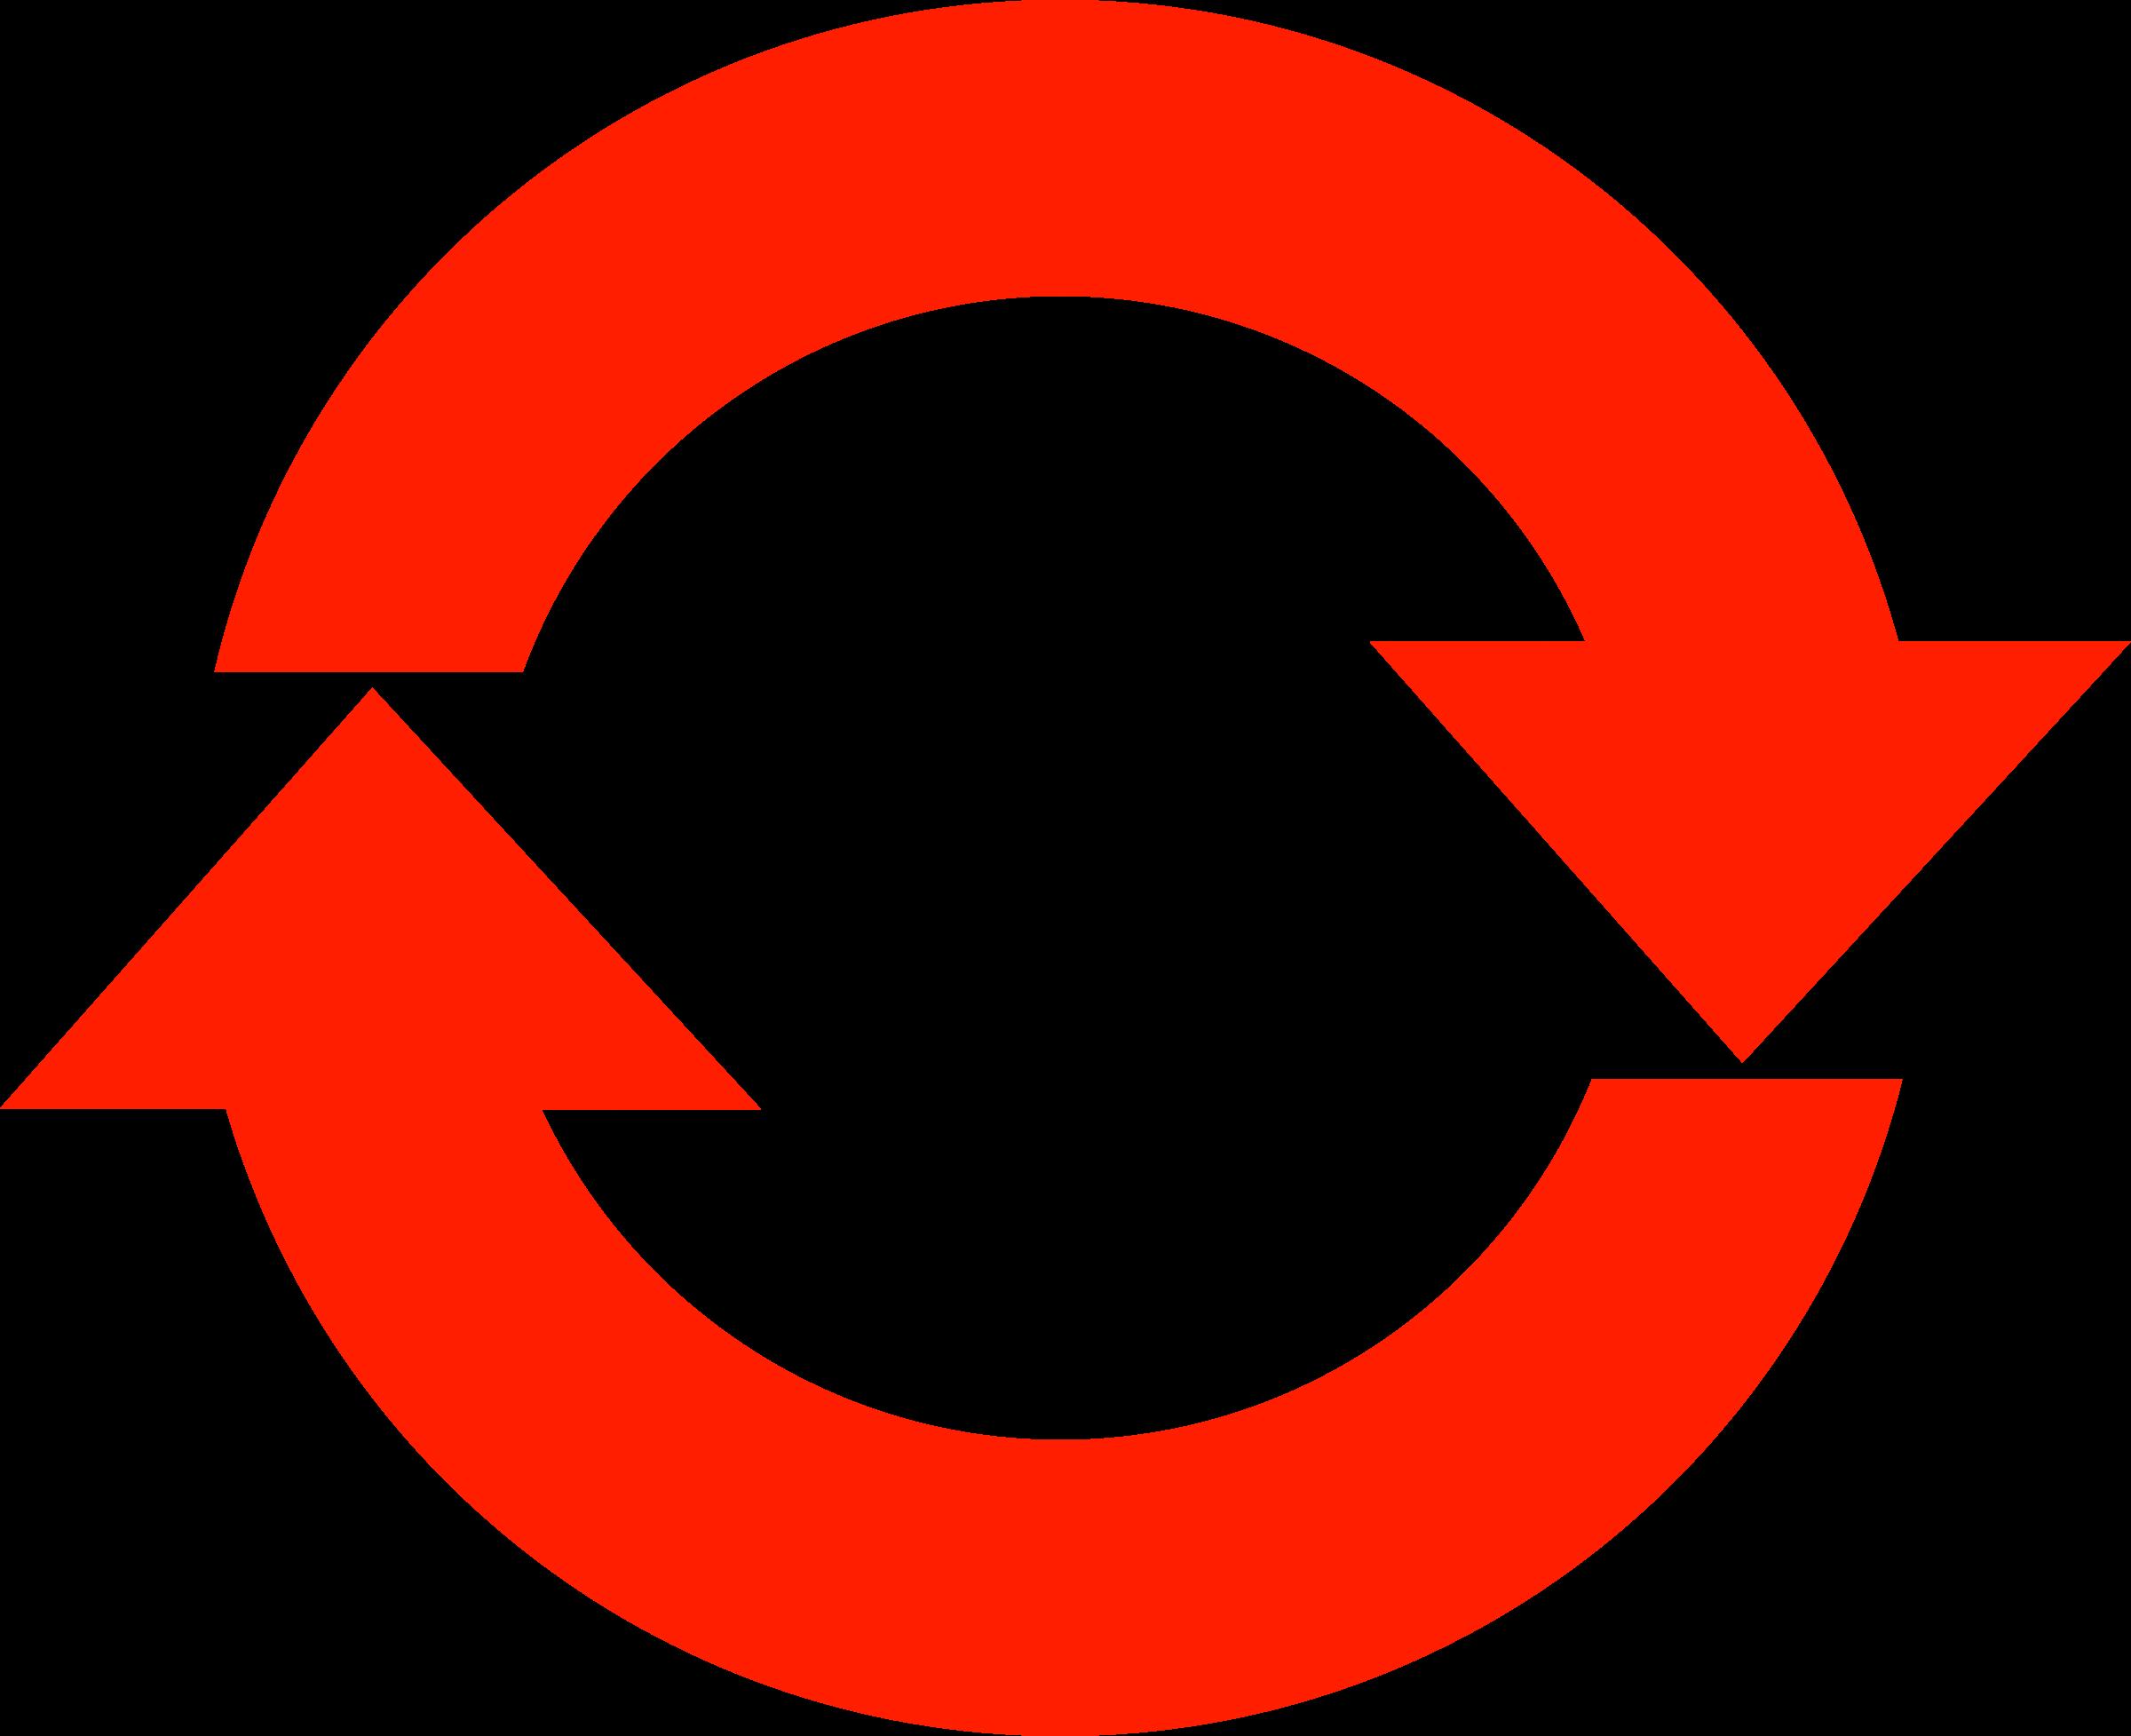 Clipart circle arrow. Refresh icon simple big